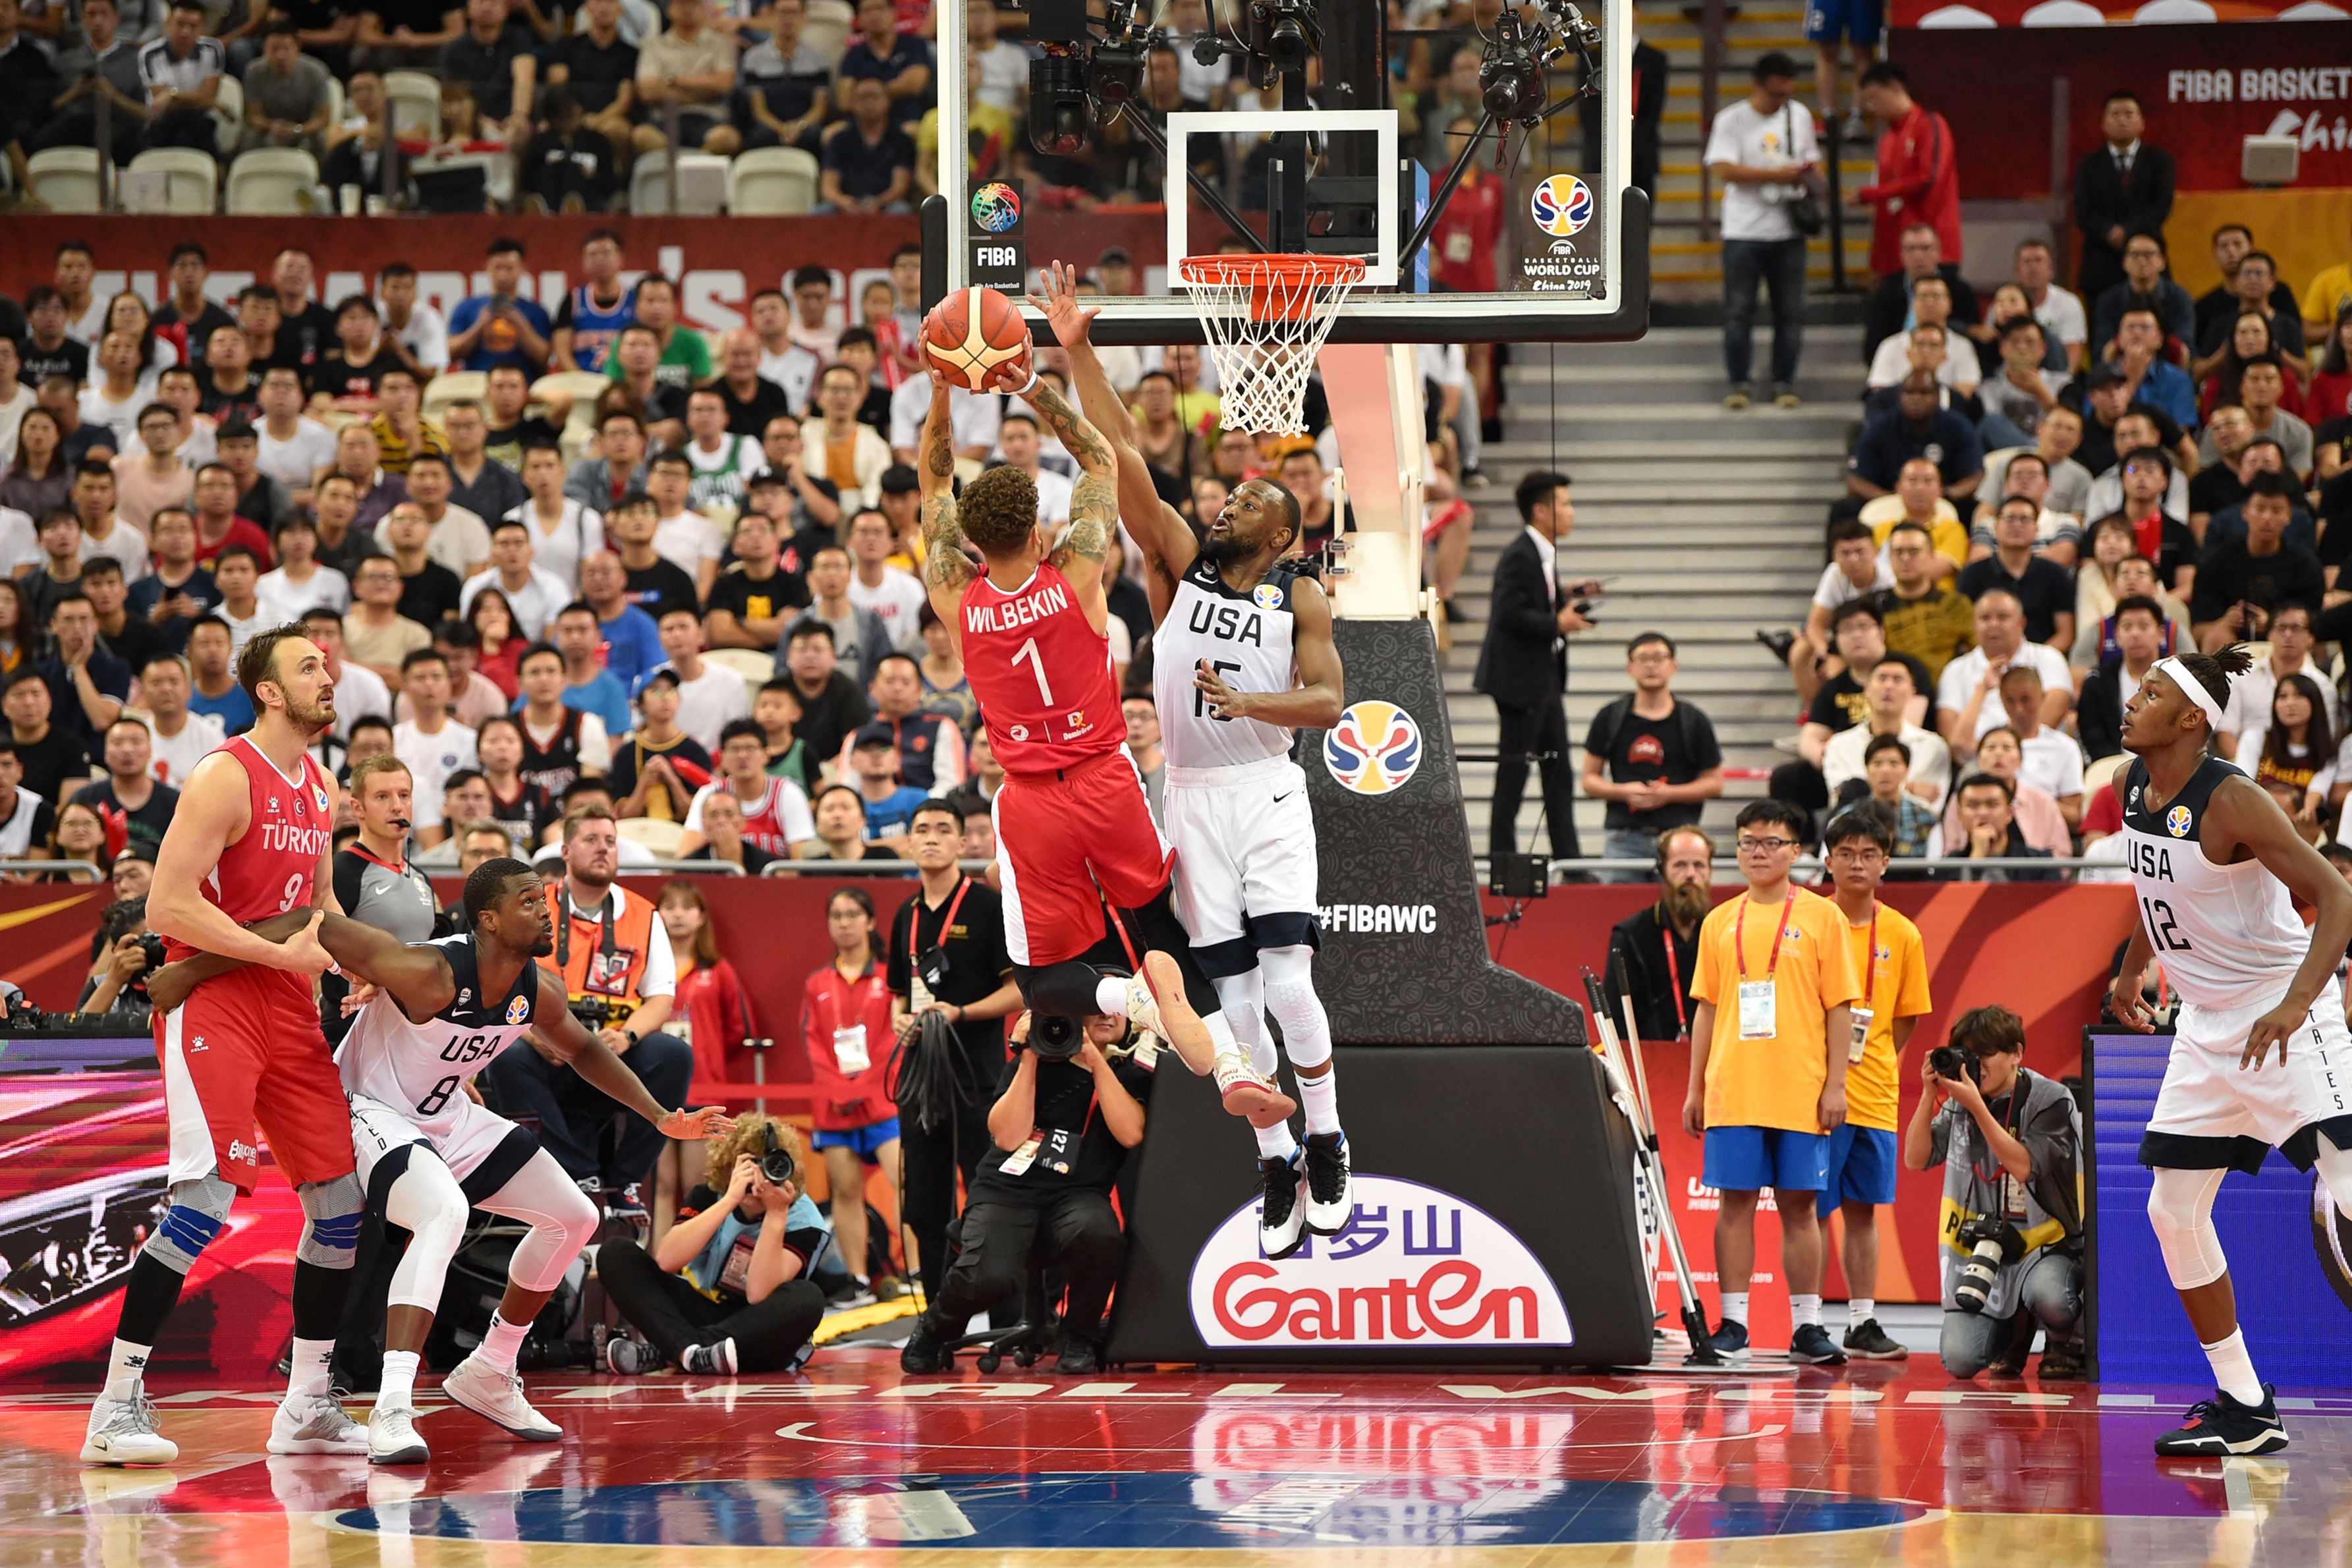 2019 FIBA Basketball World Cup - USA v Turkey